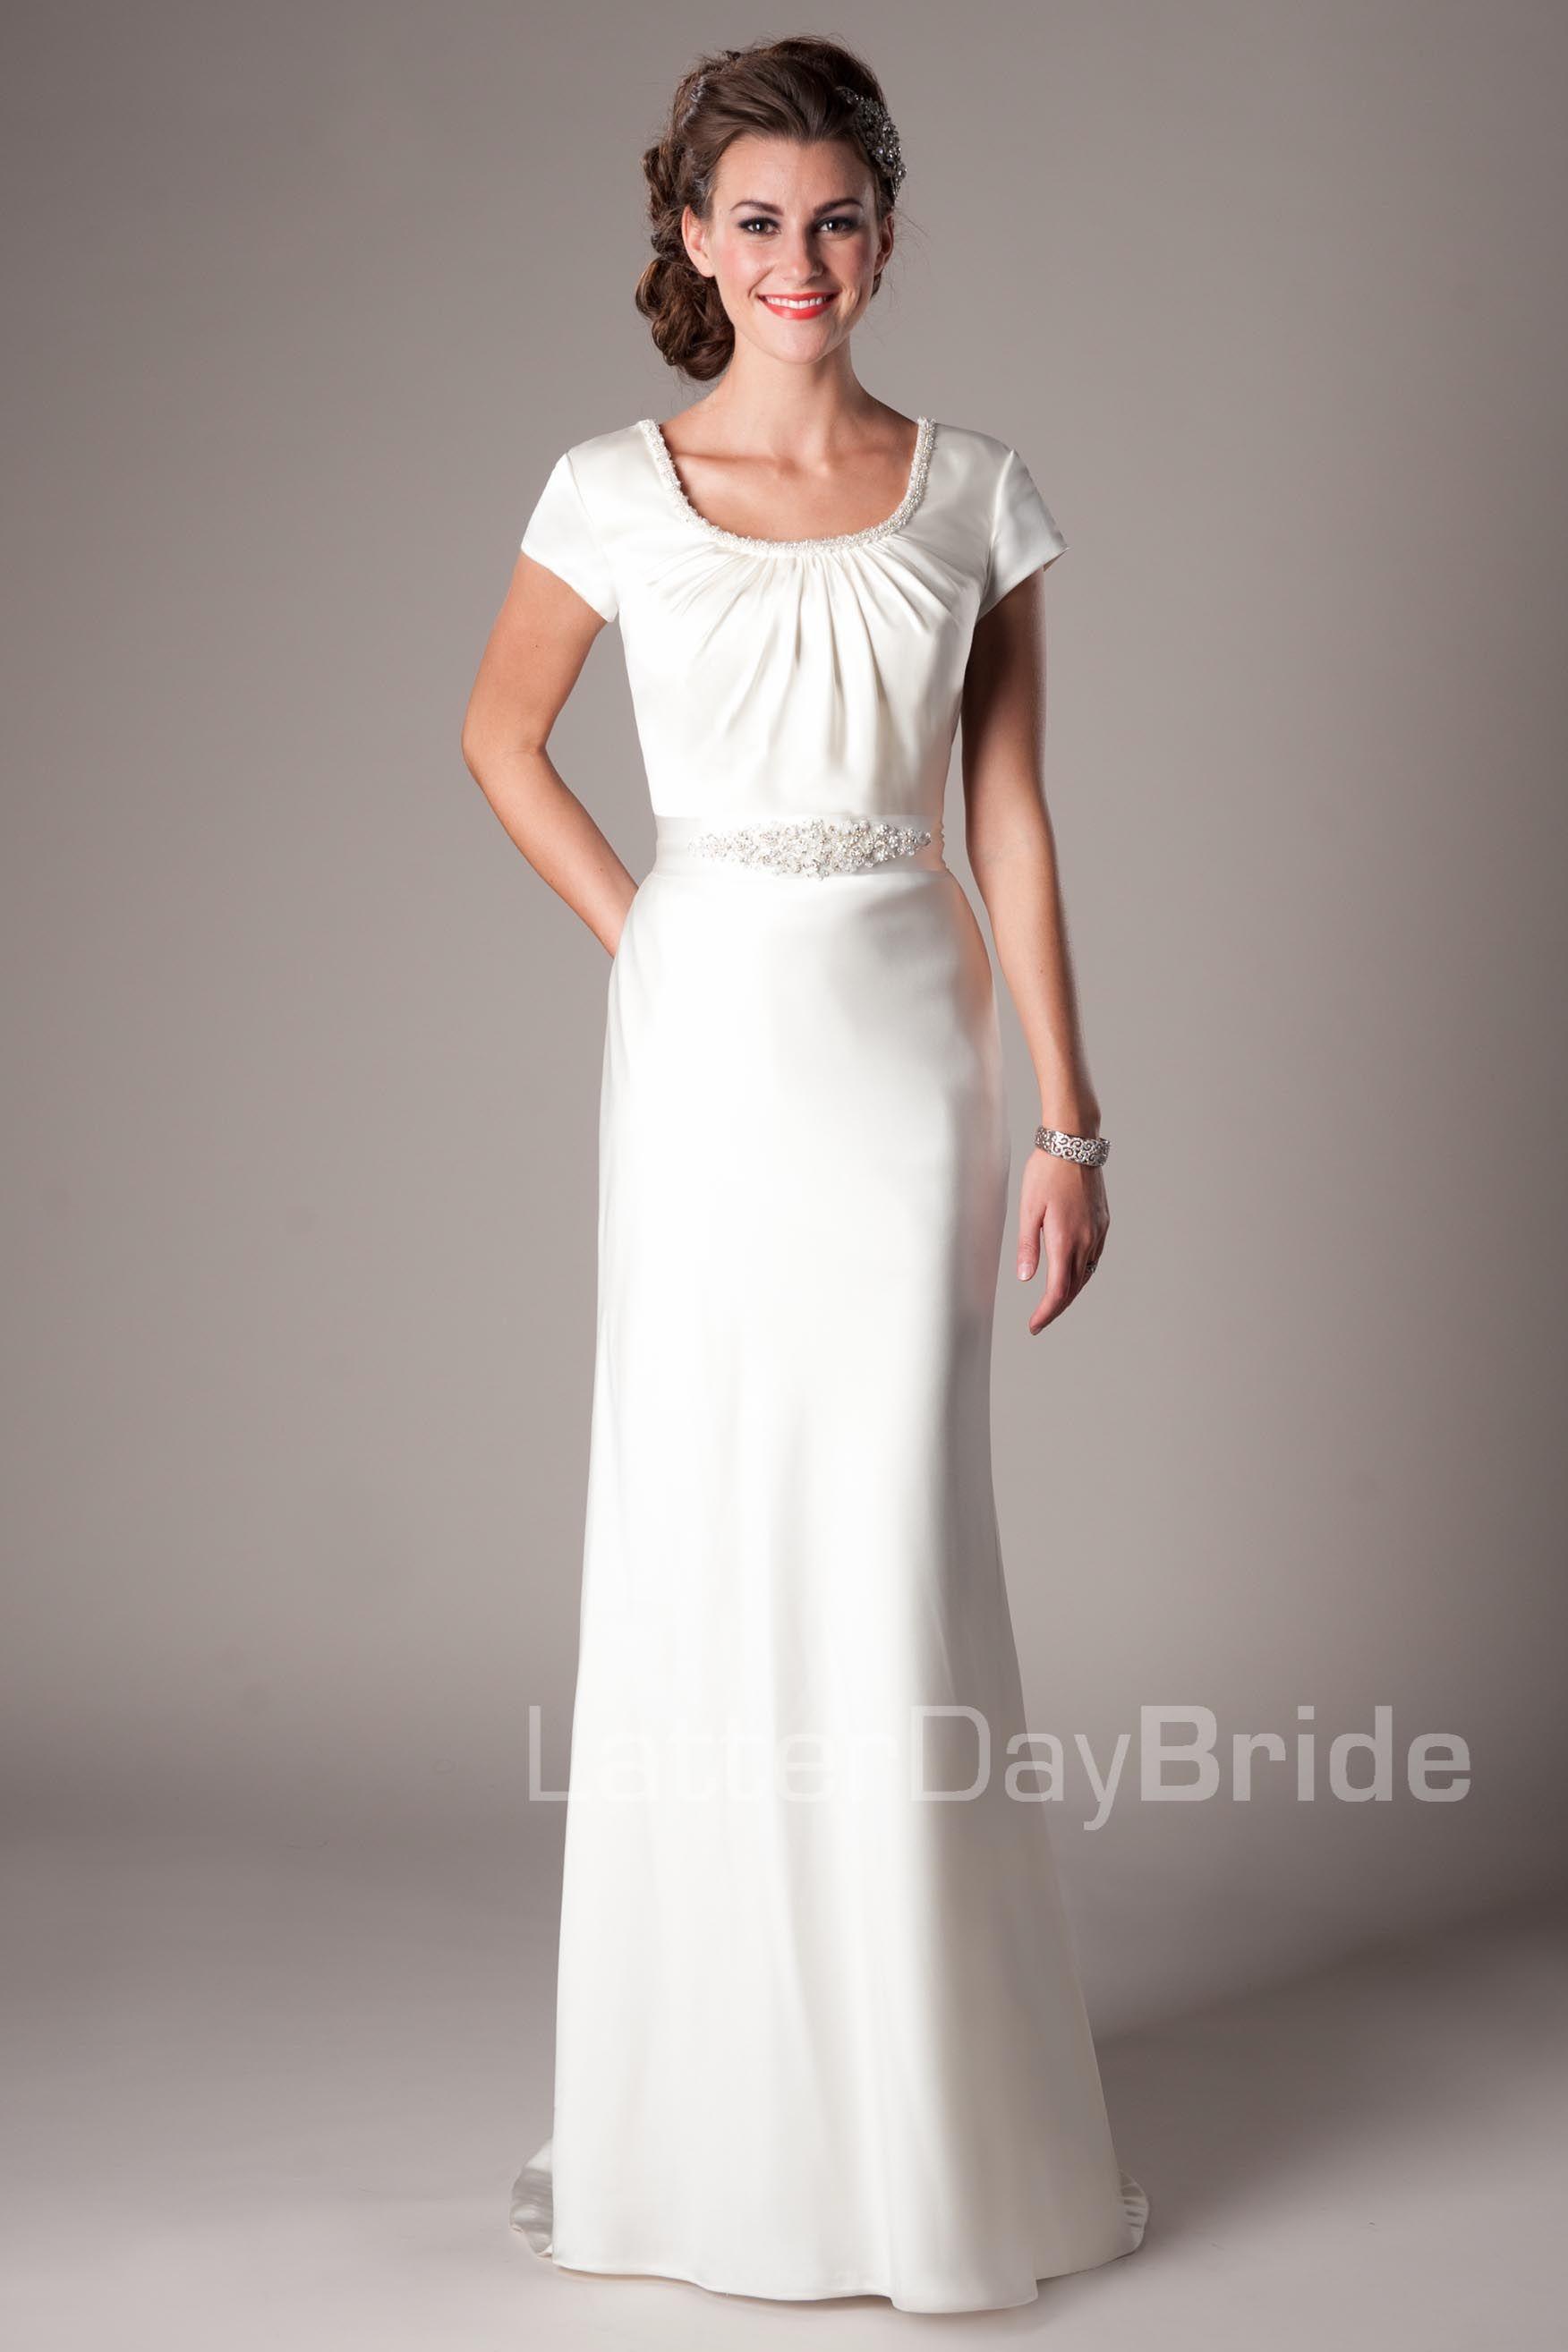 Arezzo modest wedding dress latter day bride prom for Latter day wedding dresses